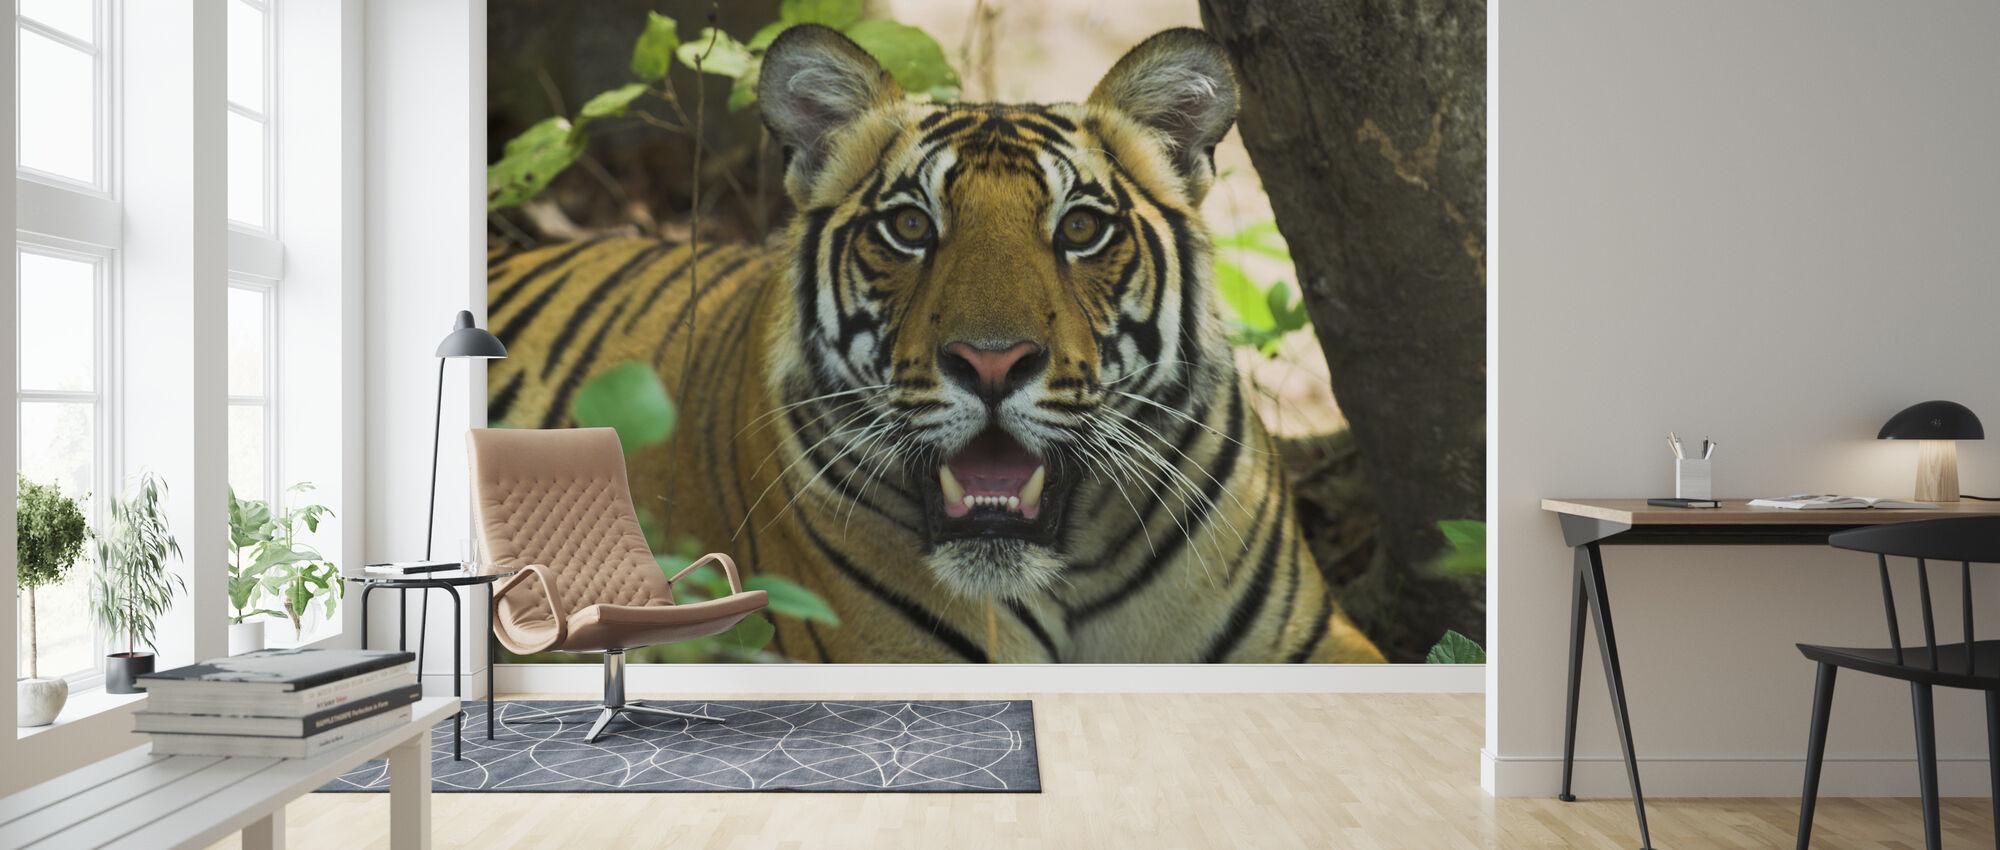 Male Bengal Tiger II - Wallpaper - Living Room